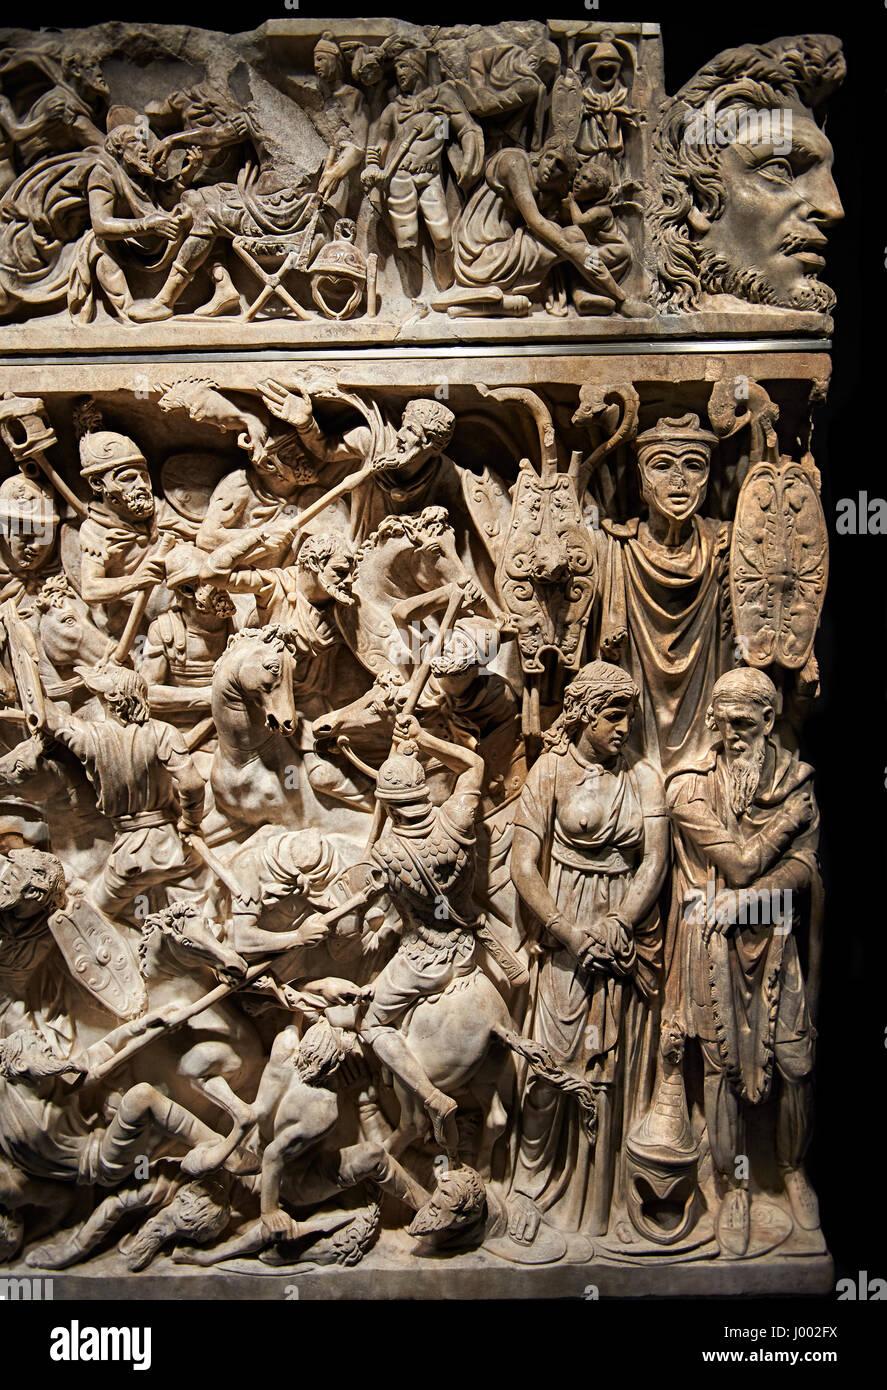 Roman Sarcophagus of Aurelius Julius Pompilius with detailed relief sculptured panels with battle scenes. National - Stock Image